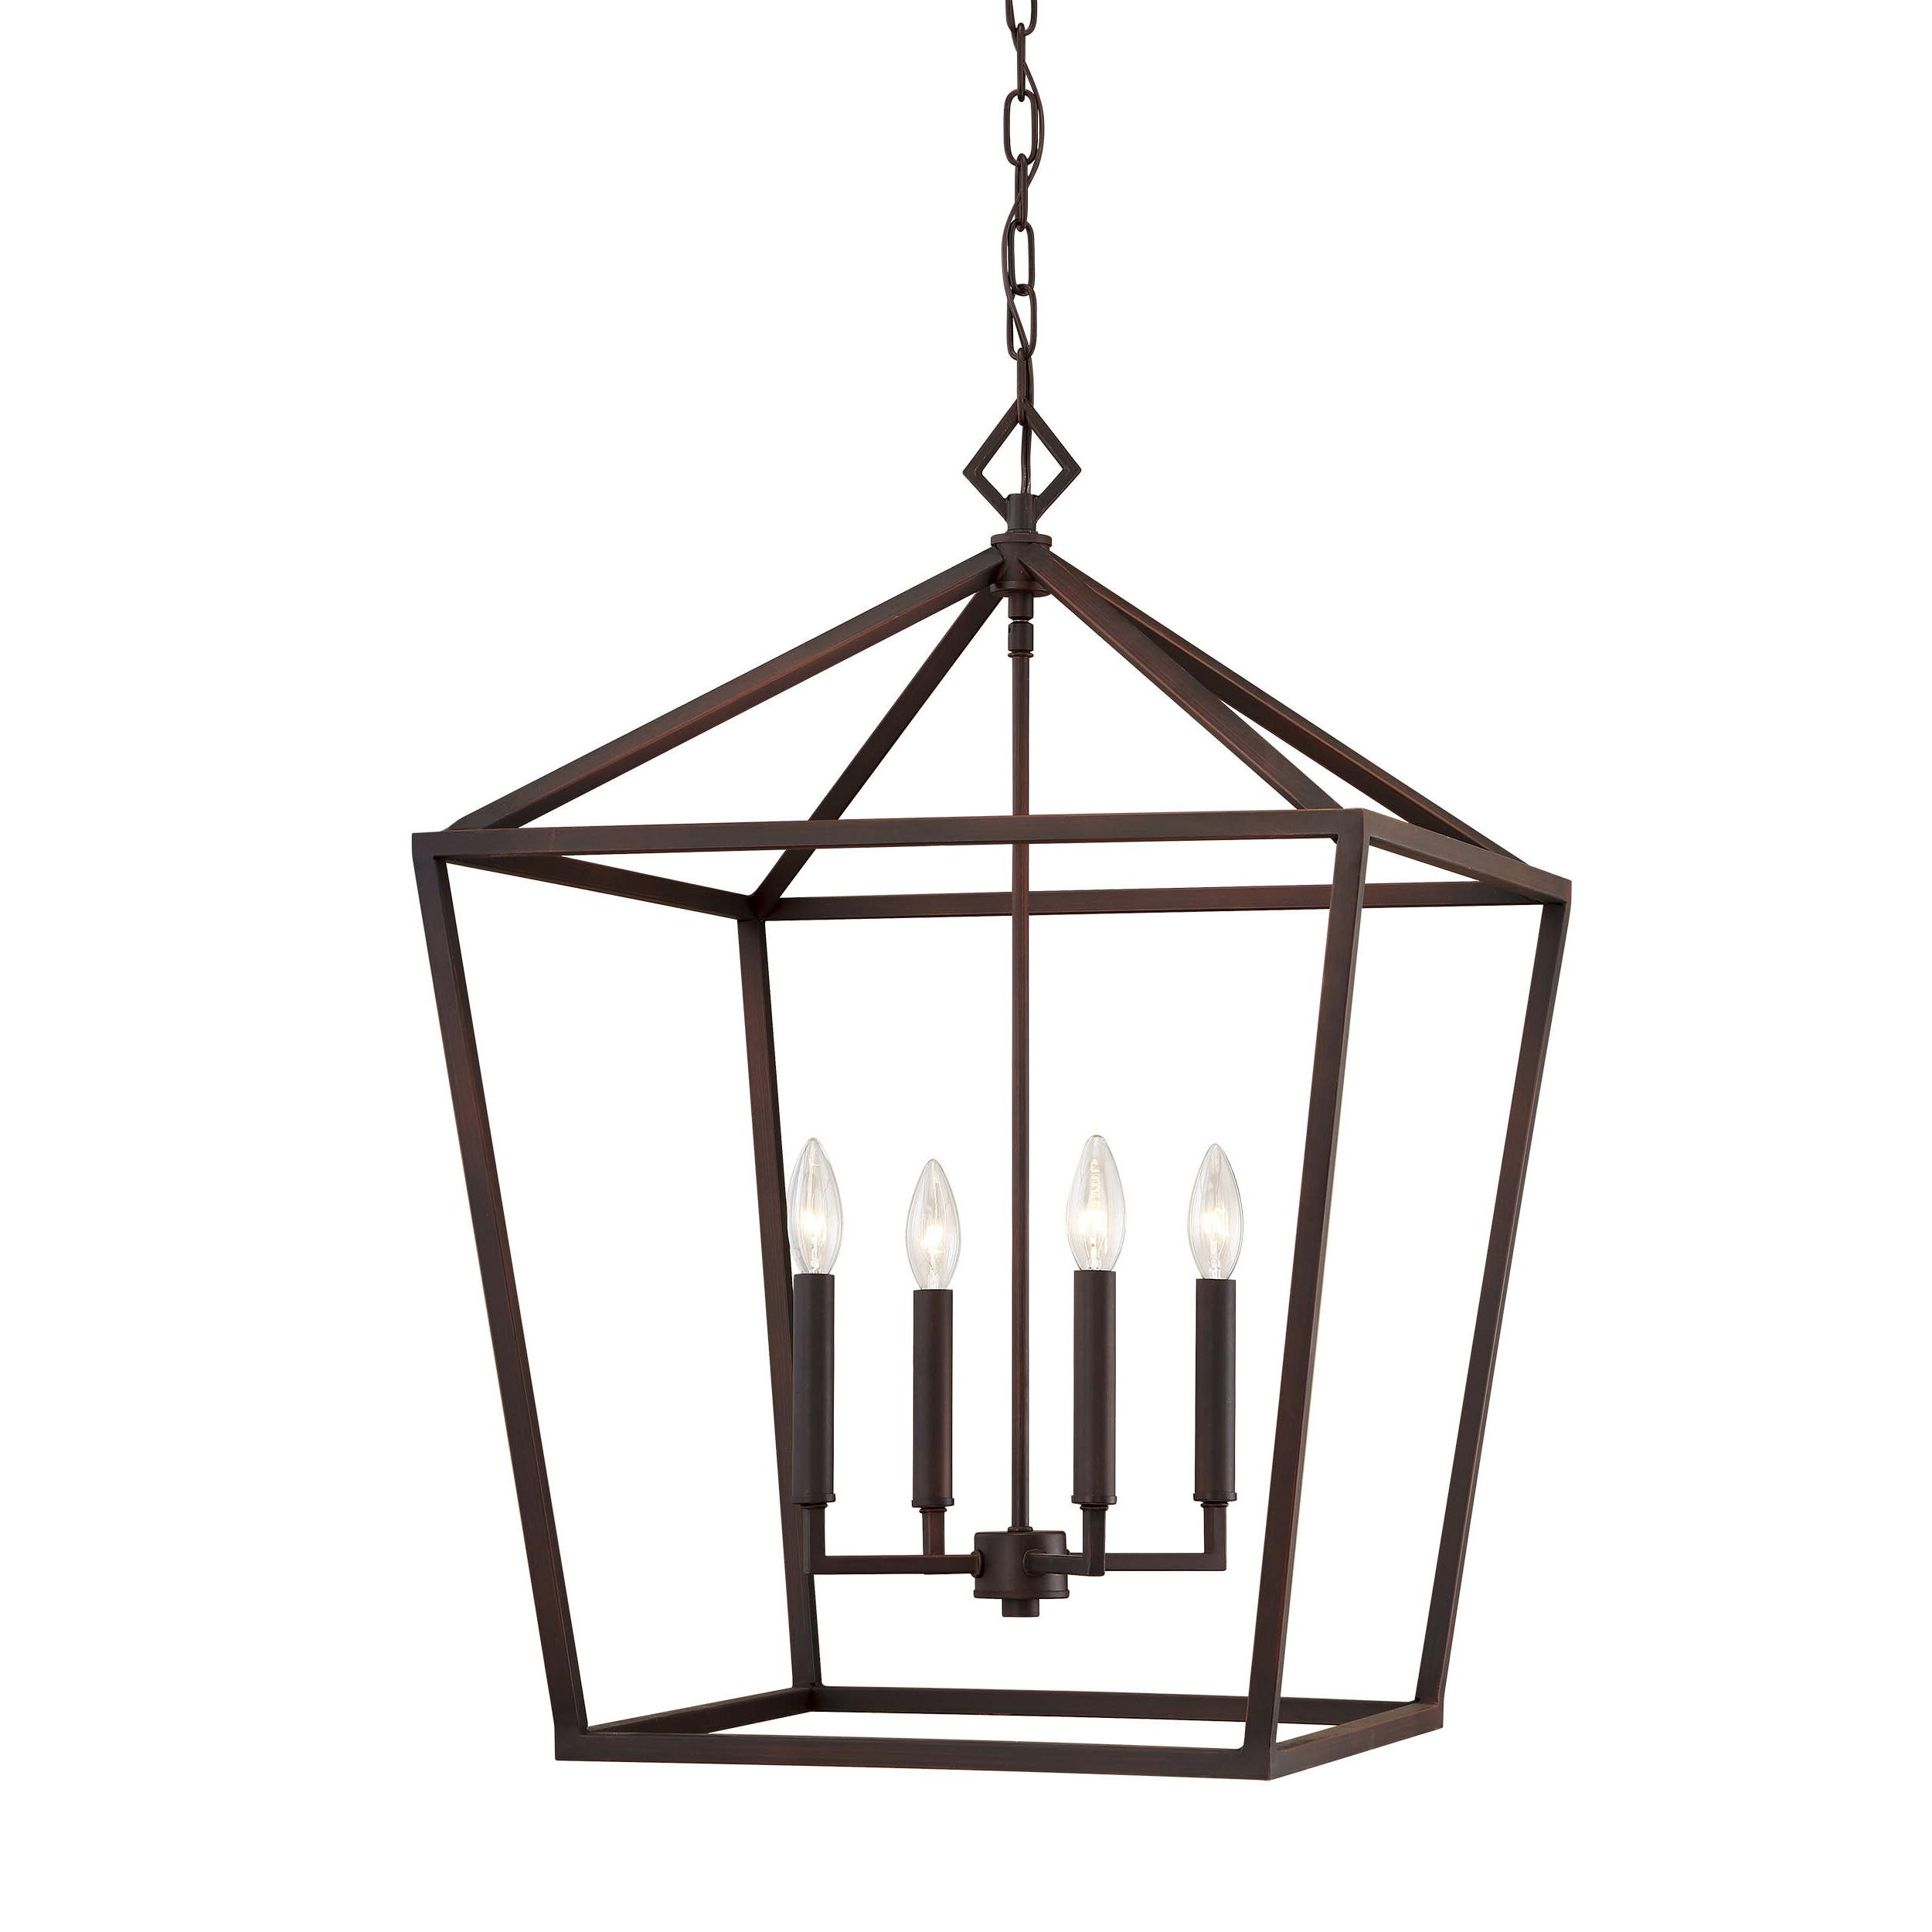 Varnum 4 Light Lantern Pendants With Current Varnum 4 Light Lantern Pendant (View 4 of 25)